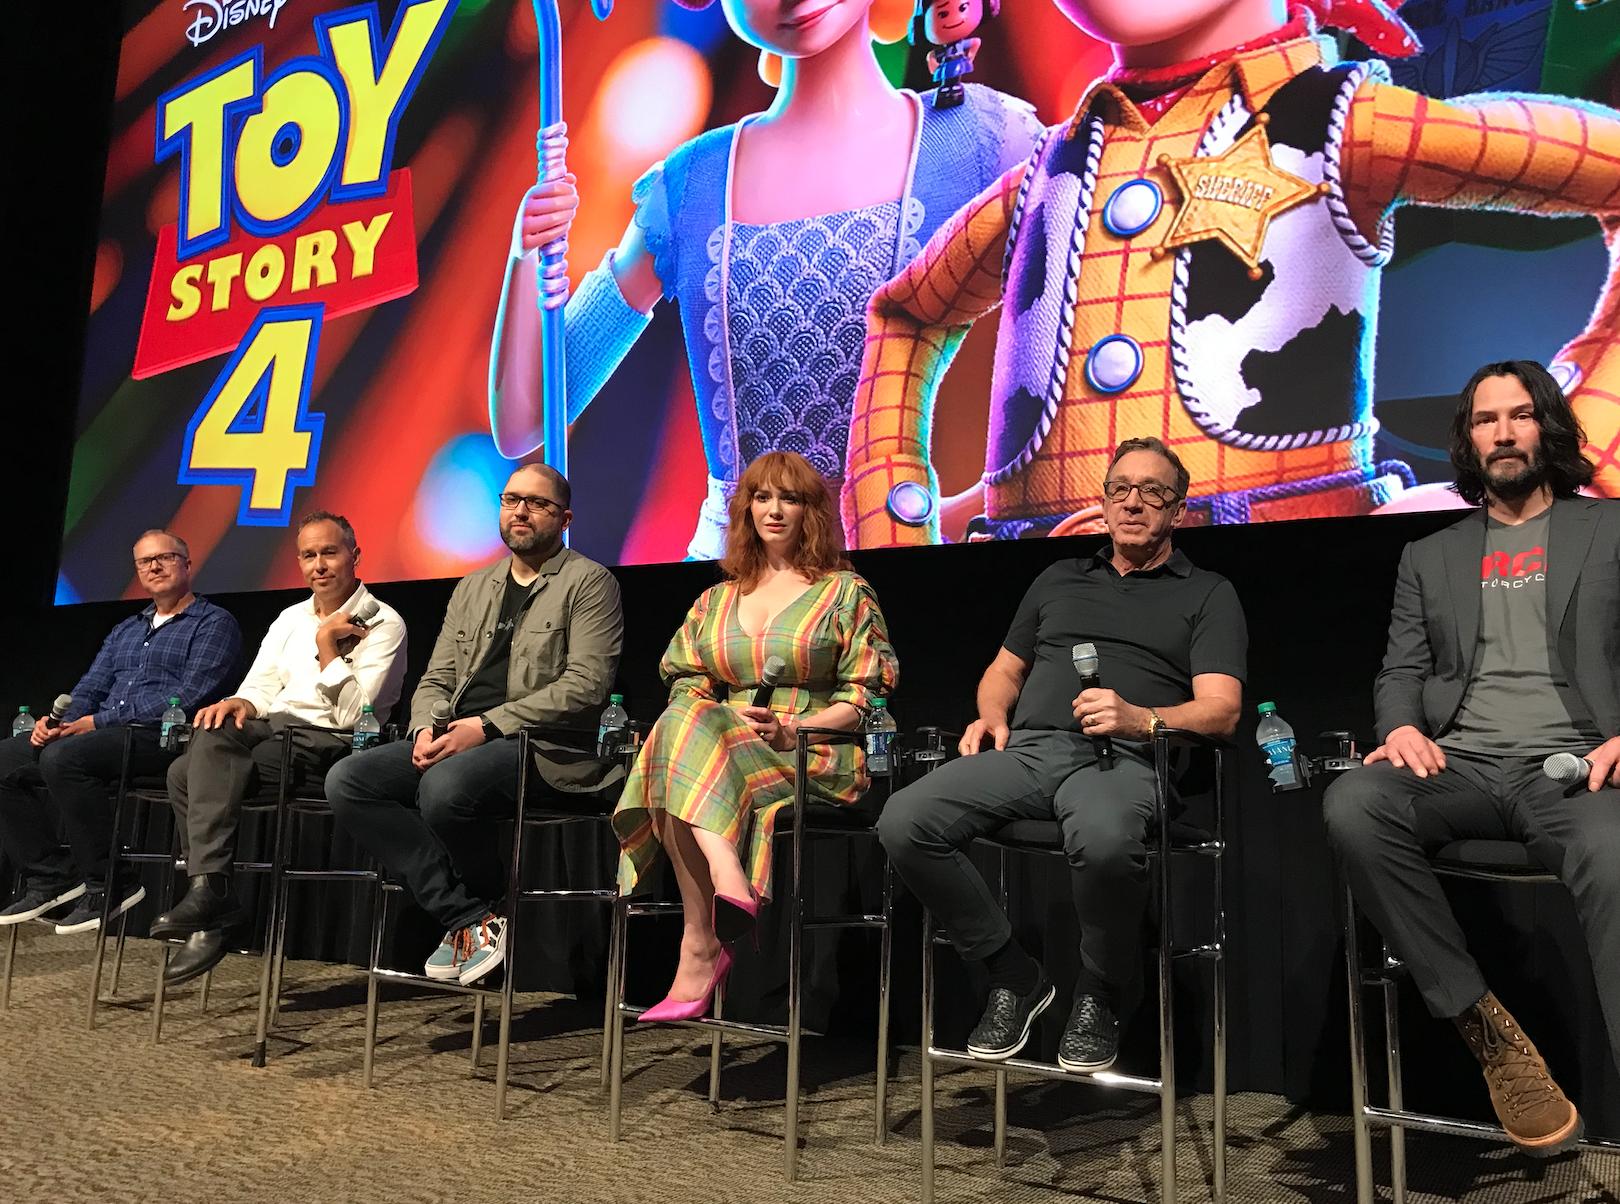 Toy Story 4 cast